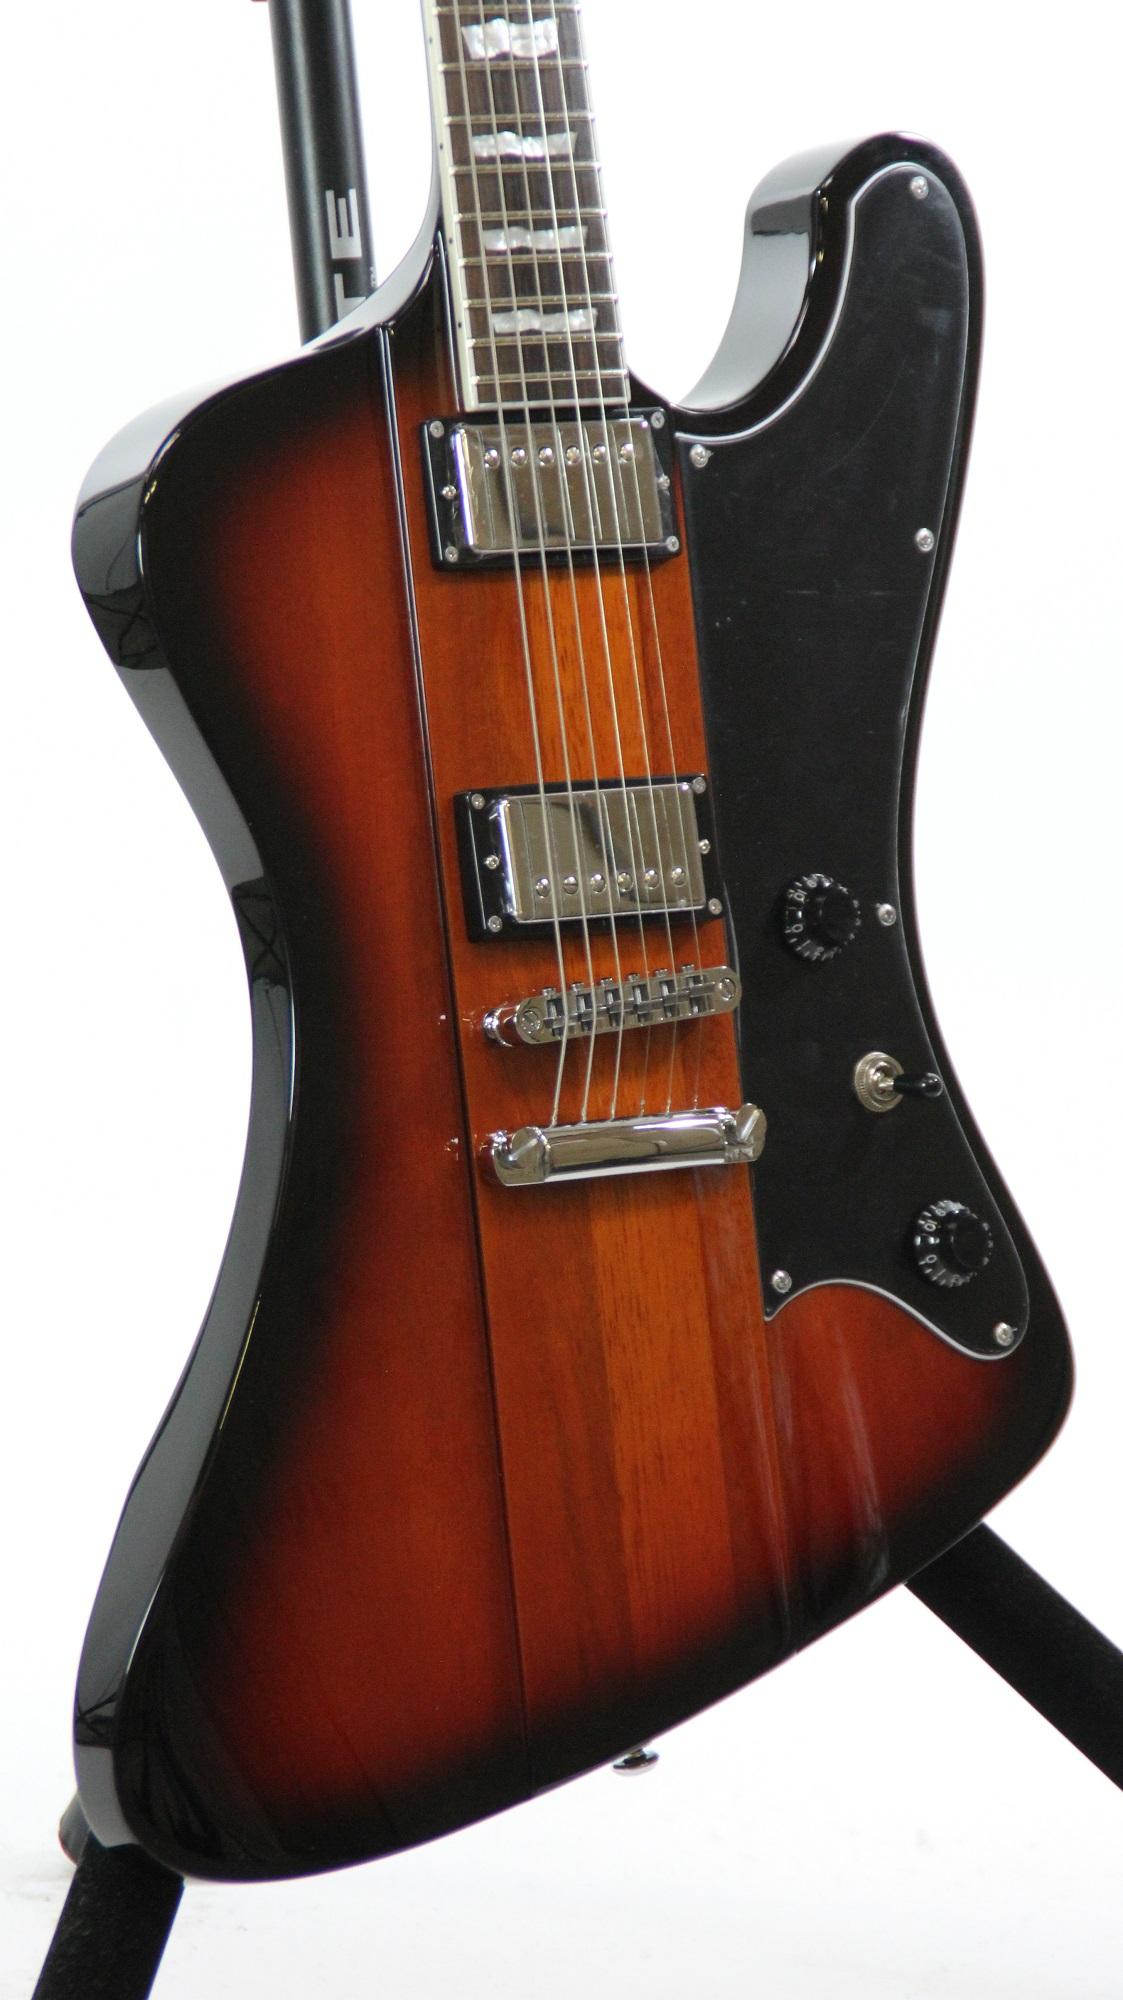 esp ltd phoenix 401 2 tone burst sample prototype electric guitar 4141 6. Black Bedroom Furniture Sets. Home Design Ideas